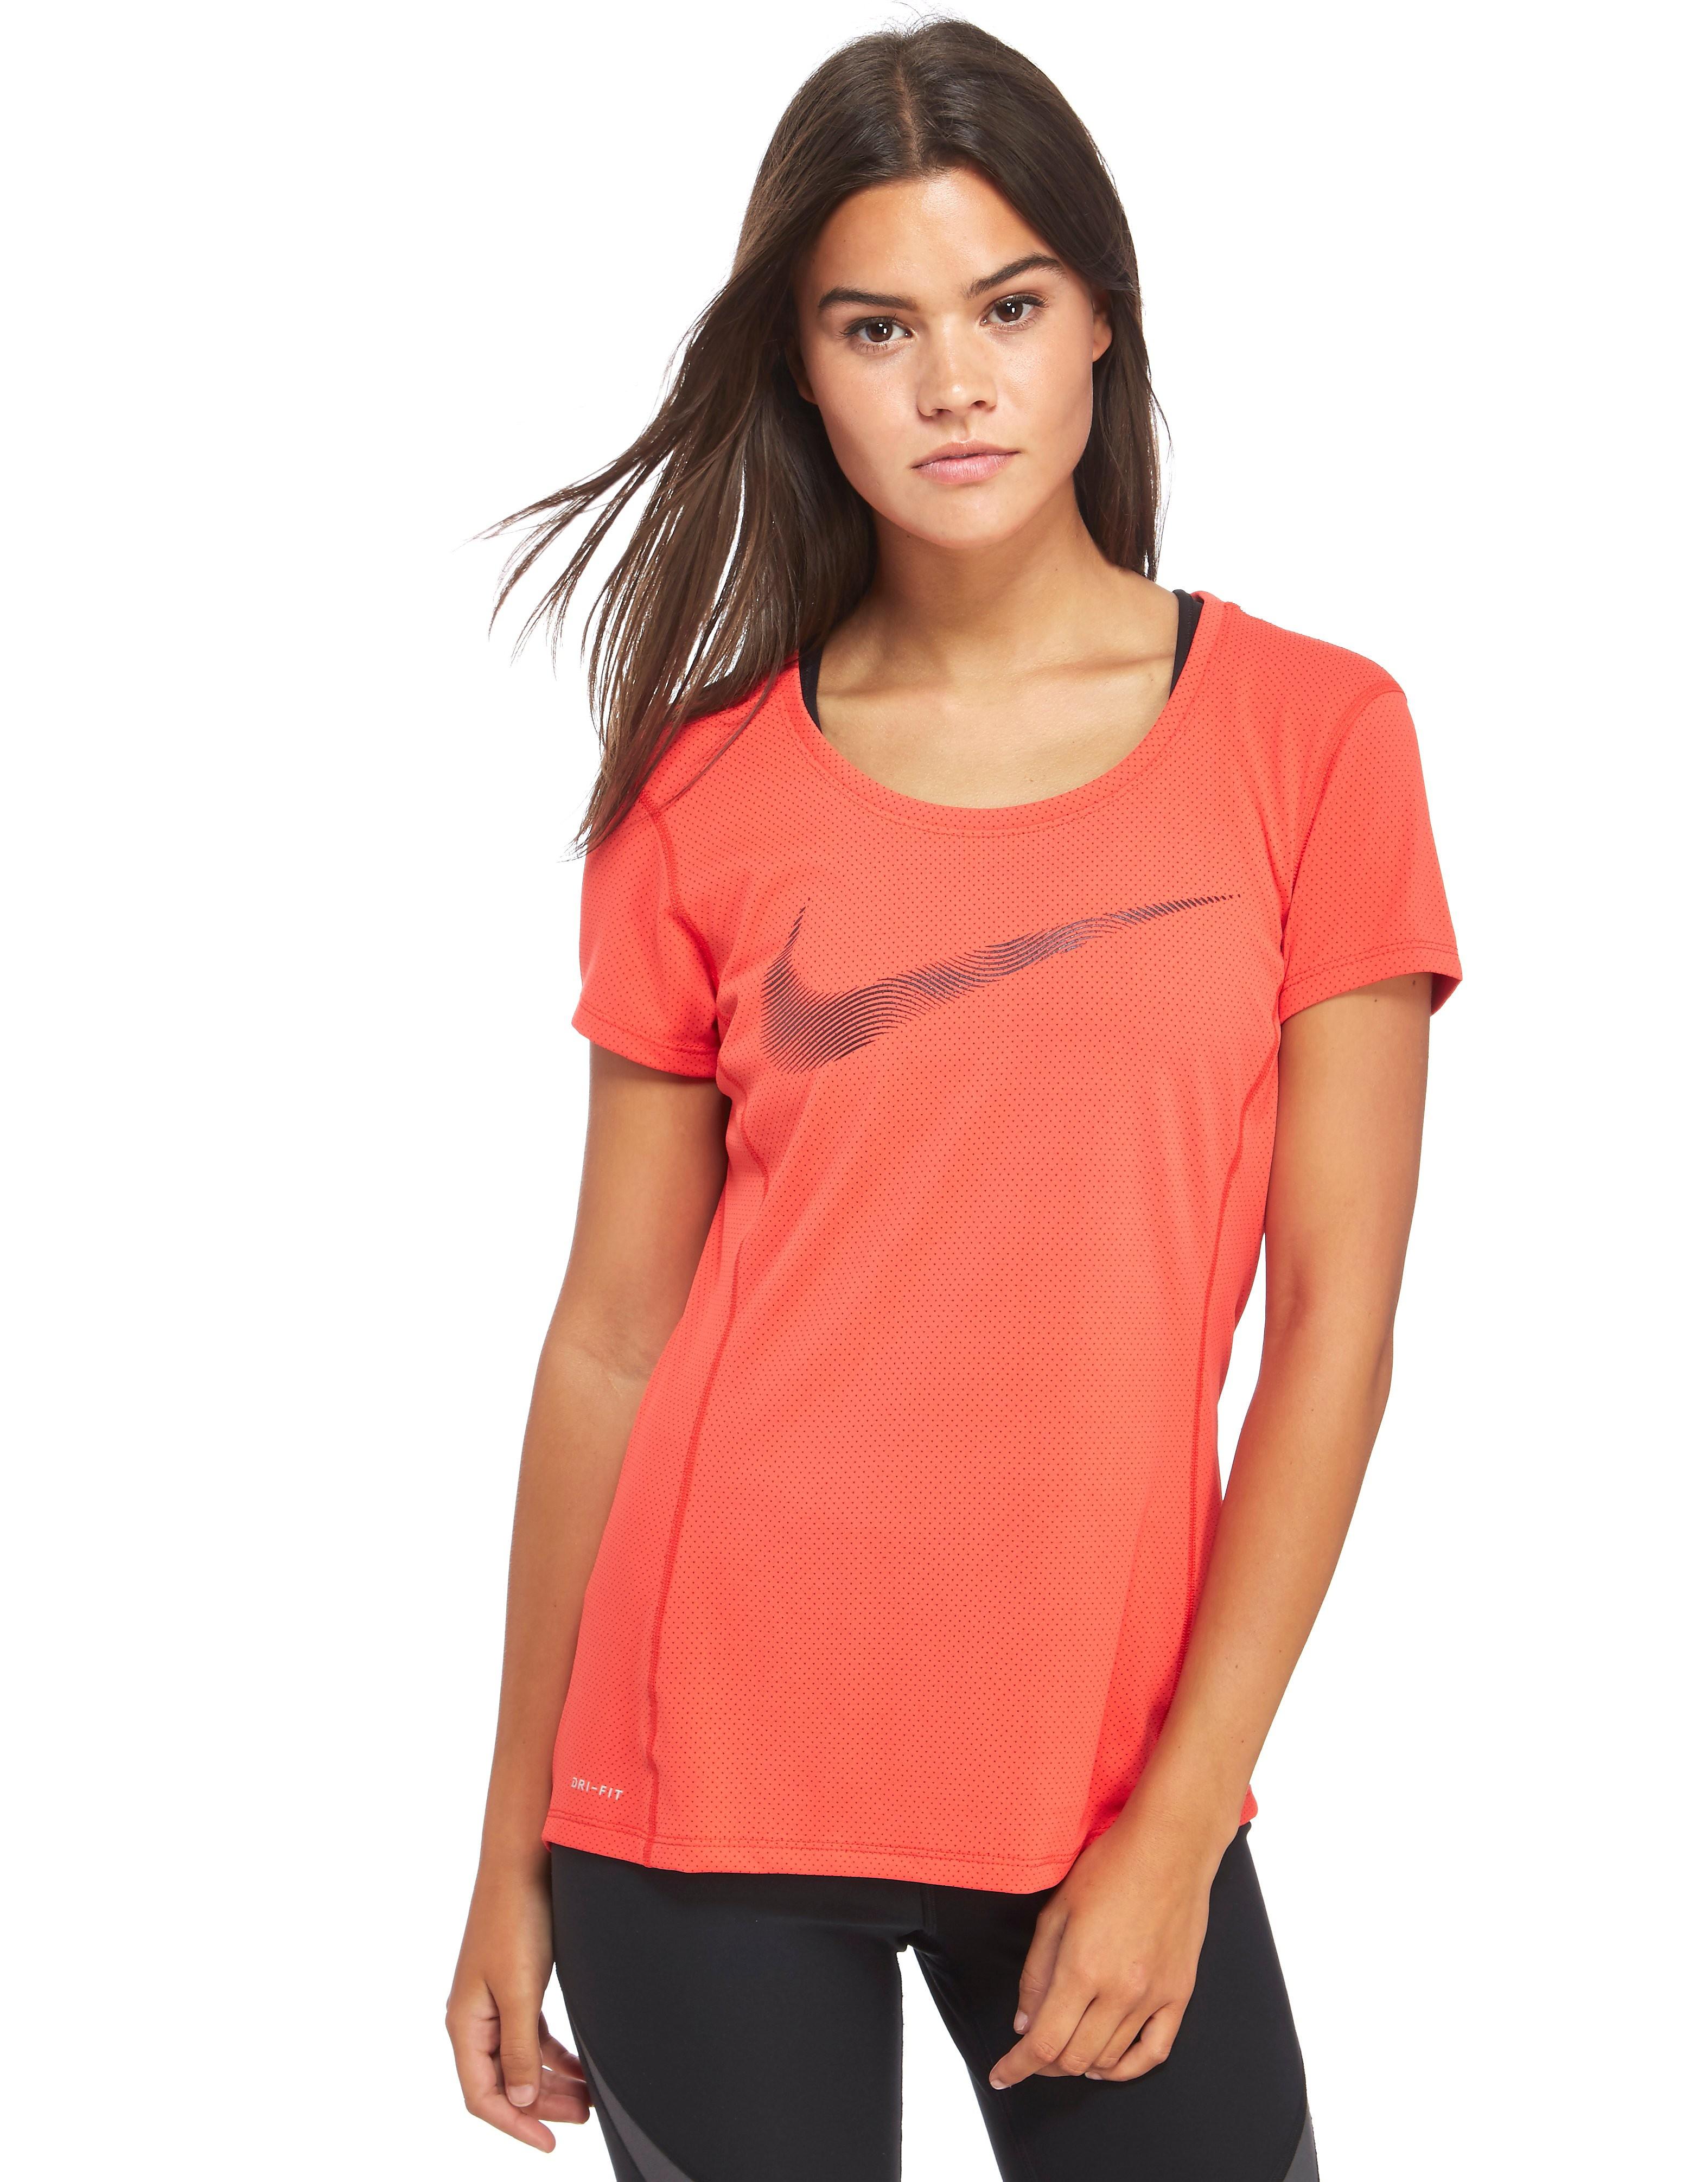 Nike Contour Swoosh T-Shirt